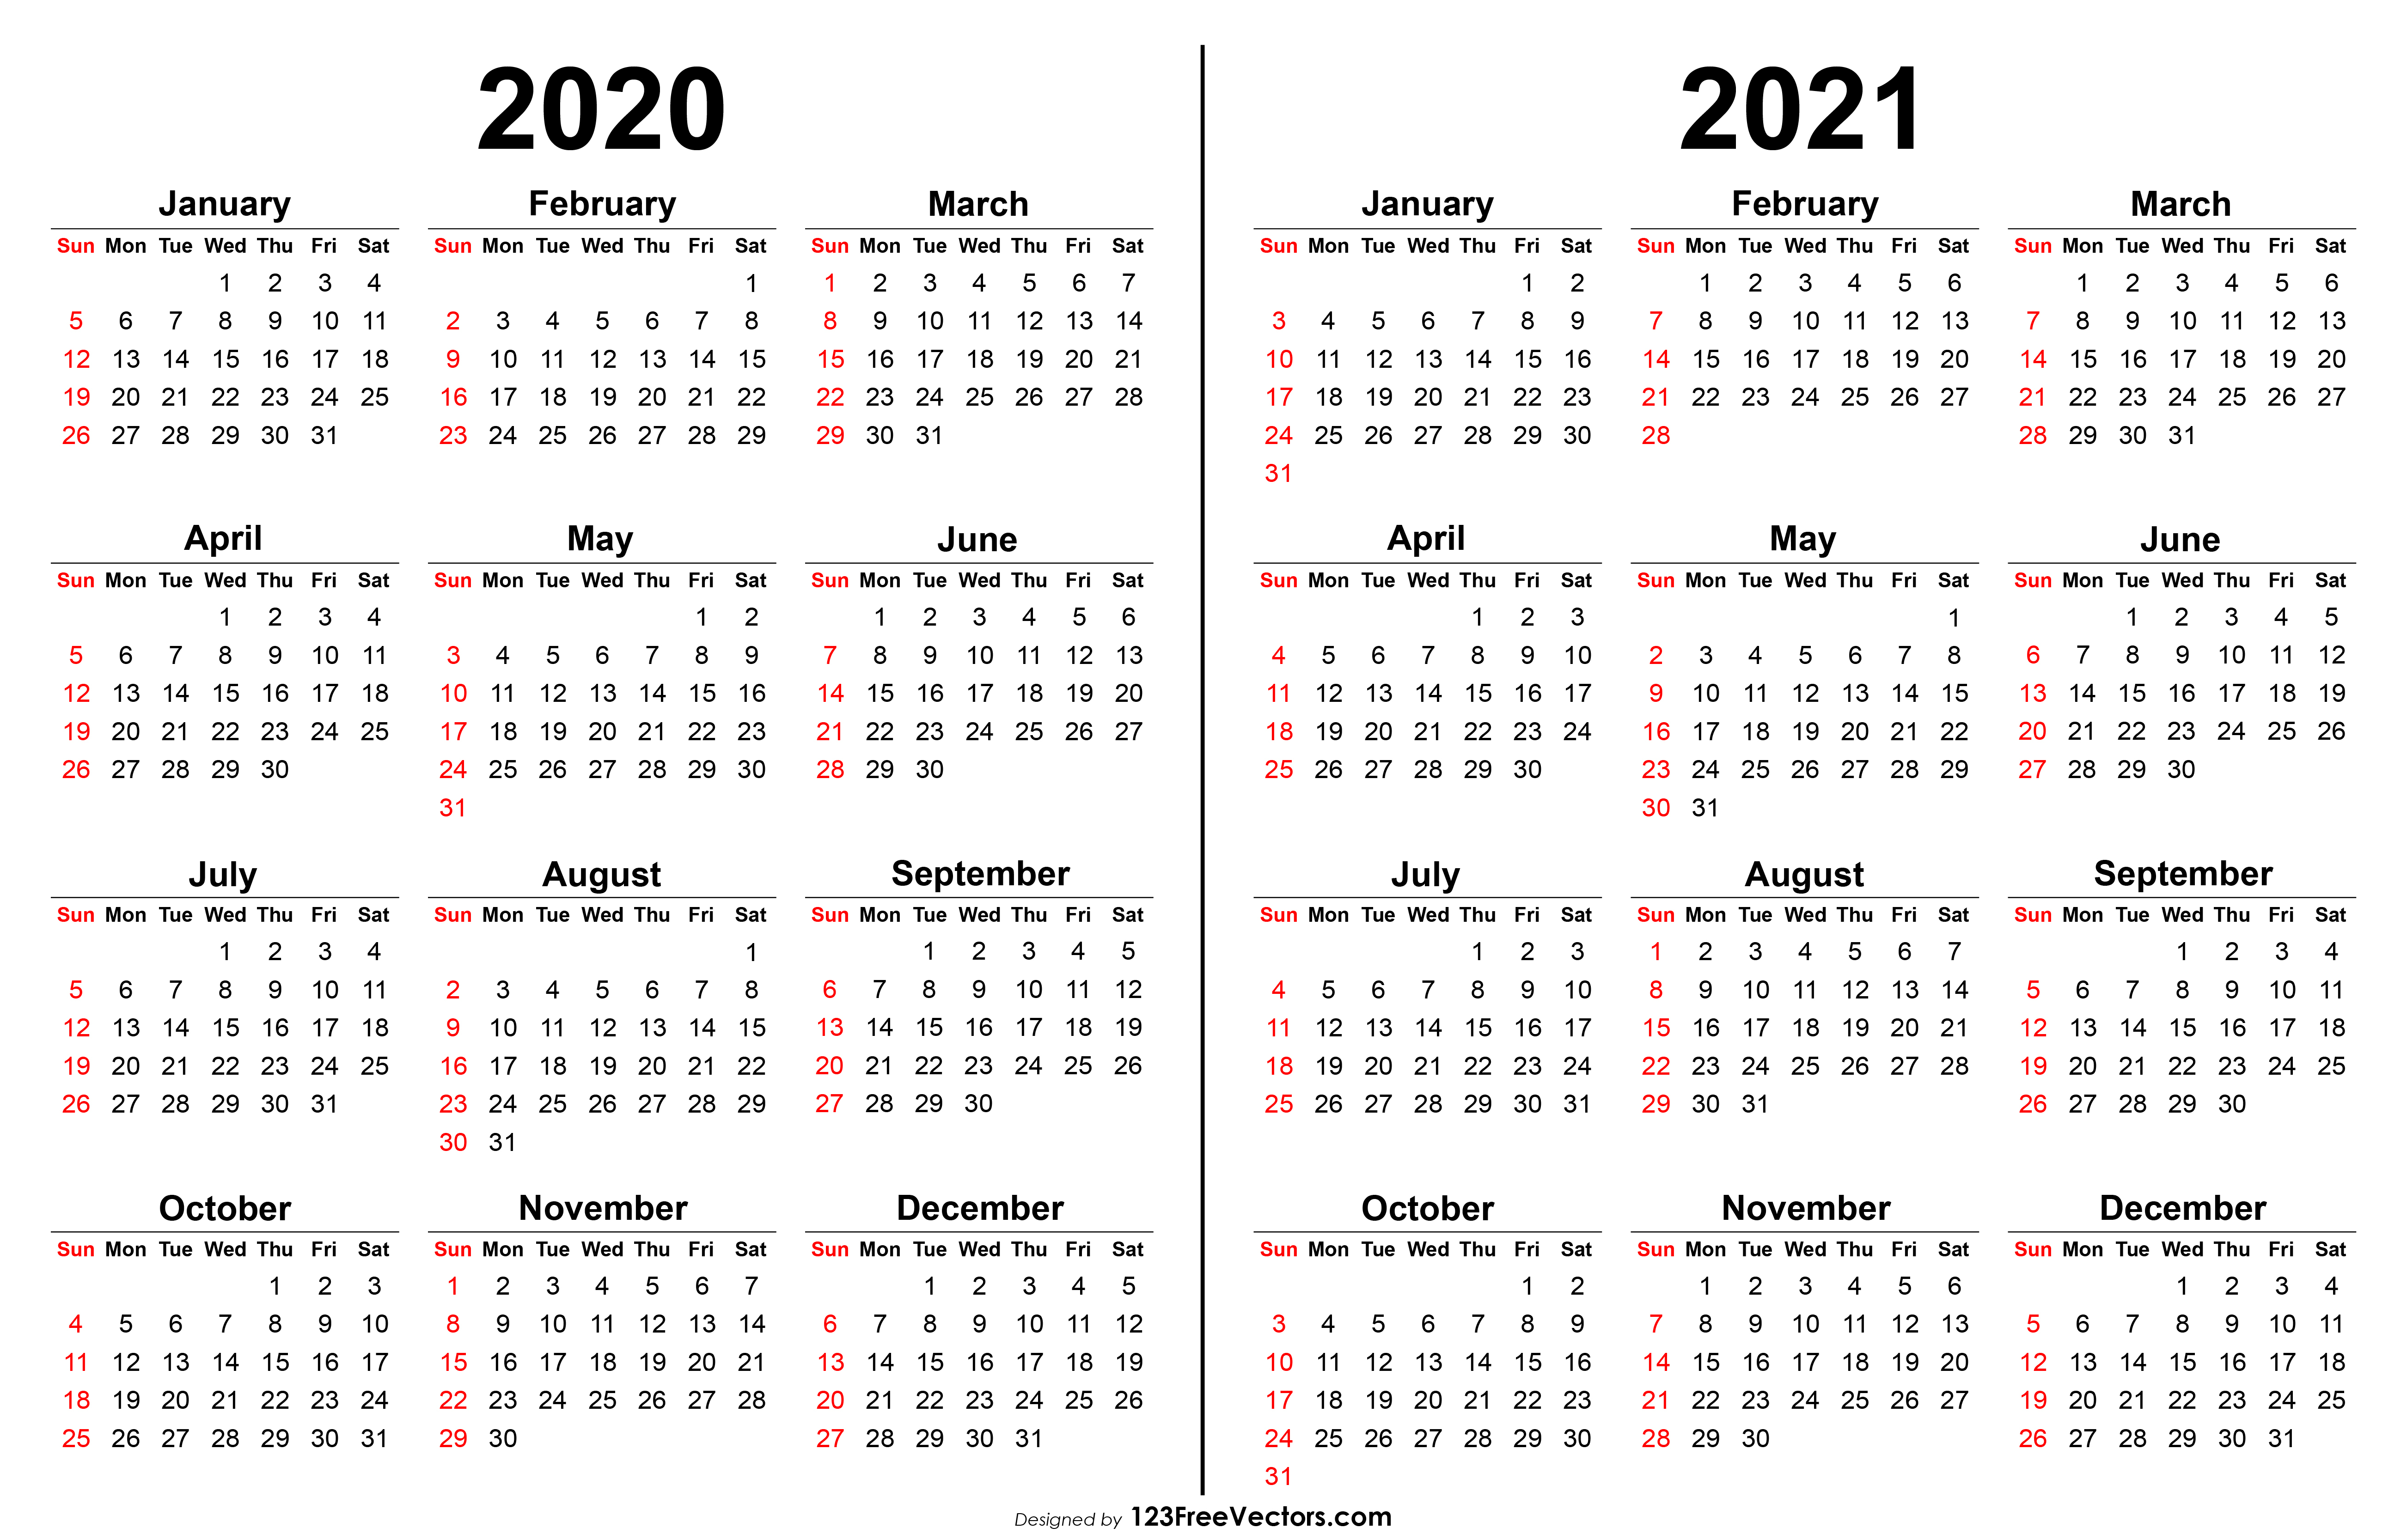 2020 2021 Calendar Throughout Fall Tv Line Up 2021 2020 Printable